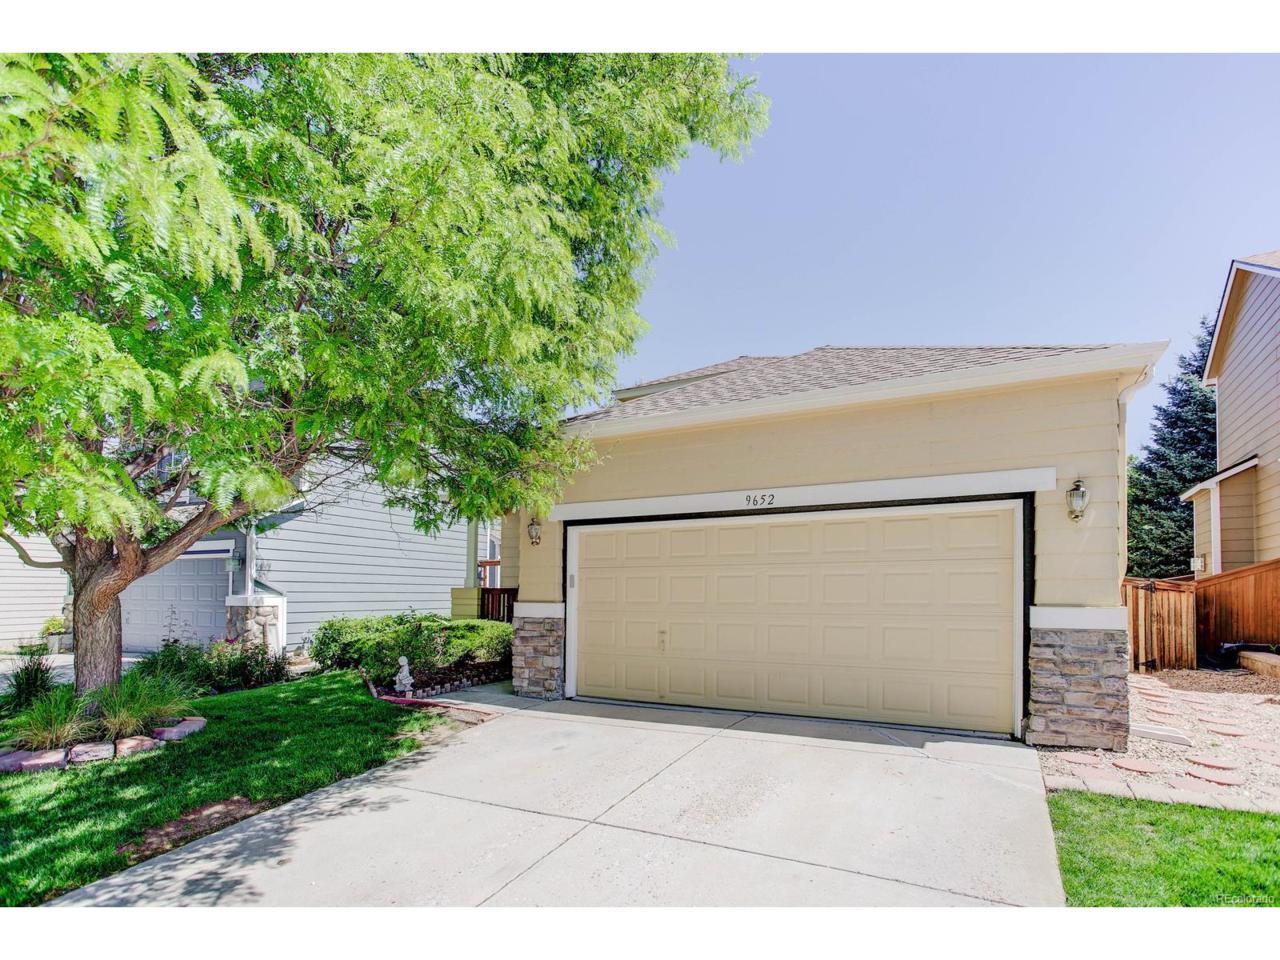 9652 Queenscliffe Drive, Highlands Ranch, CO 80130 (MLS #5051684) :: 8z Real Estate